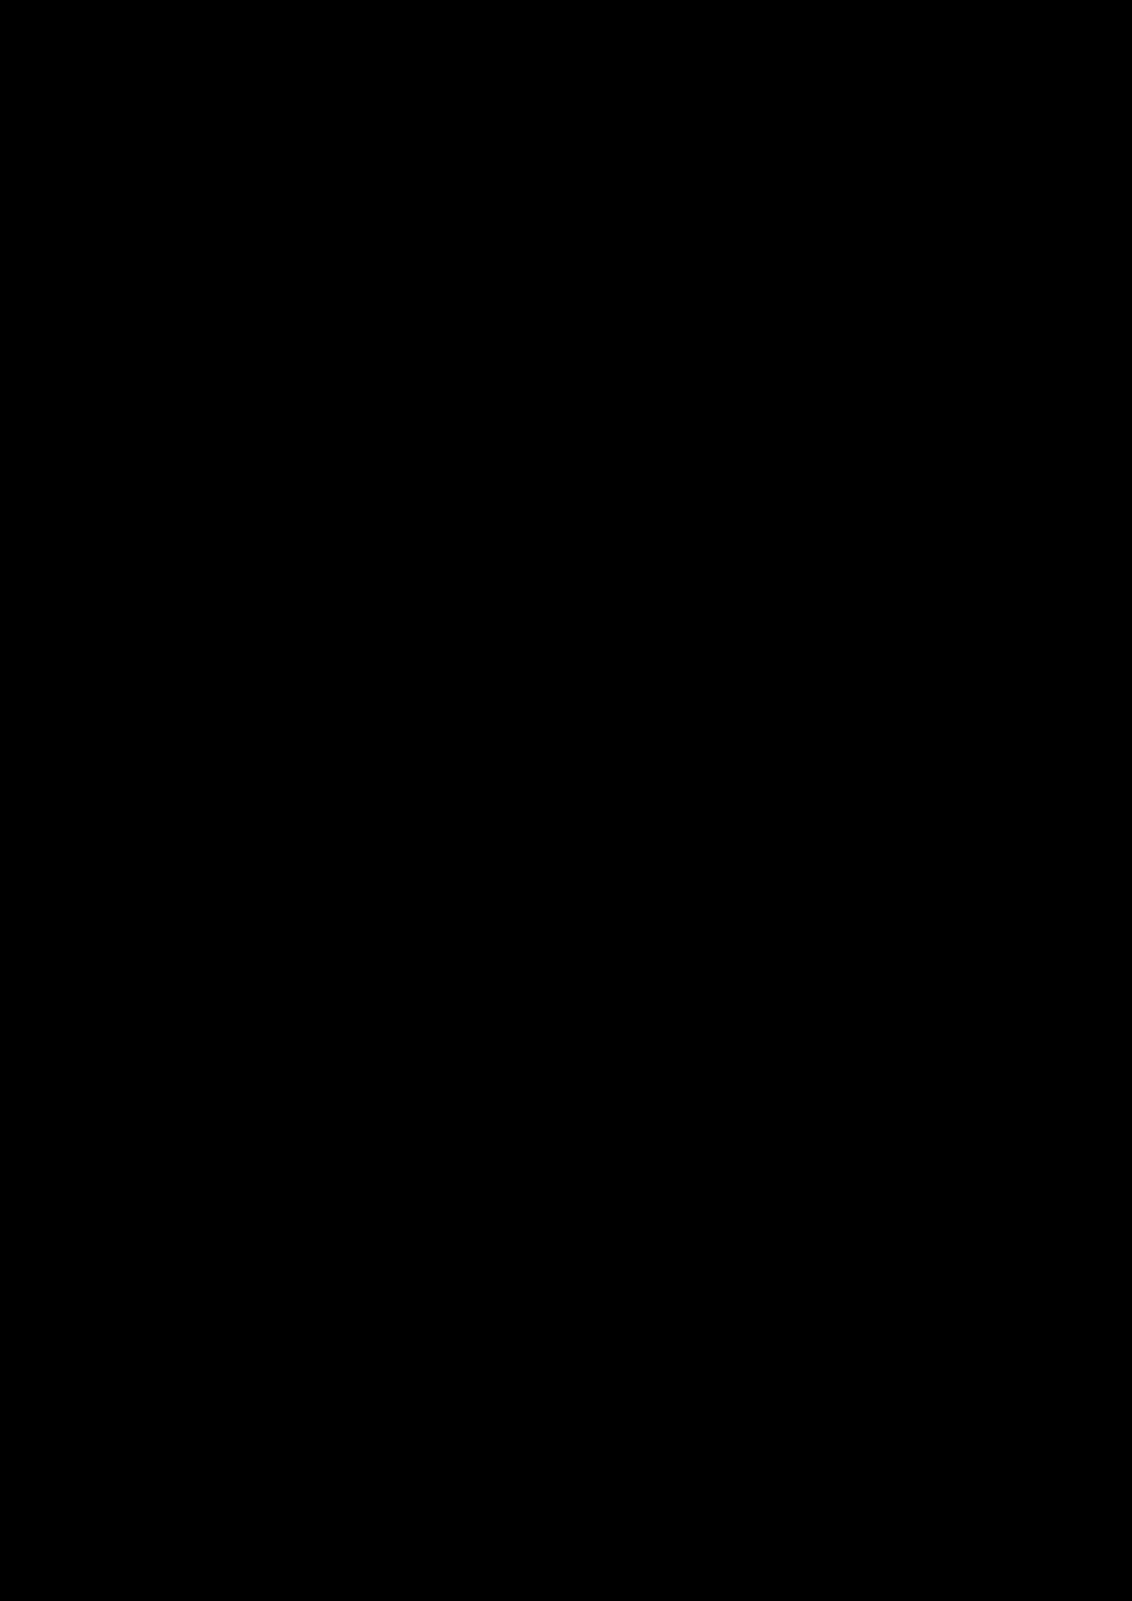 Belyiy sokol slide, Image 196